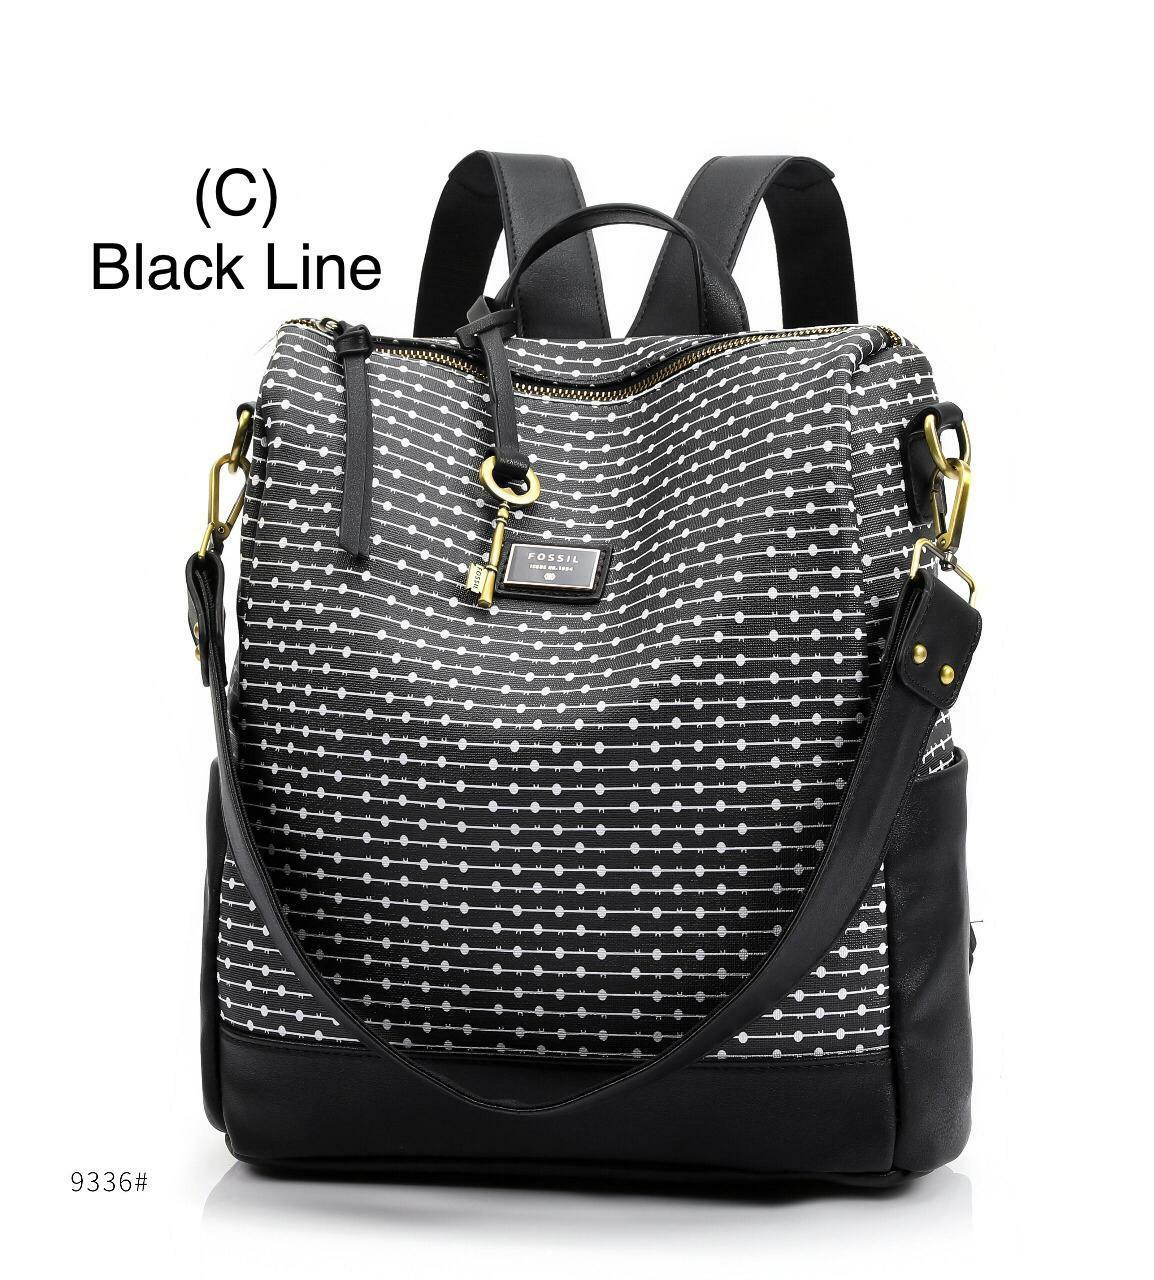 tas wanita fossil backpack ransel branded import multifungsi selempang  fashion kerja jalan santai cewek best seller 4eeaee13b2